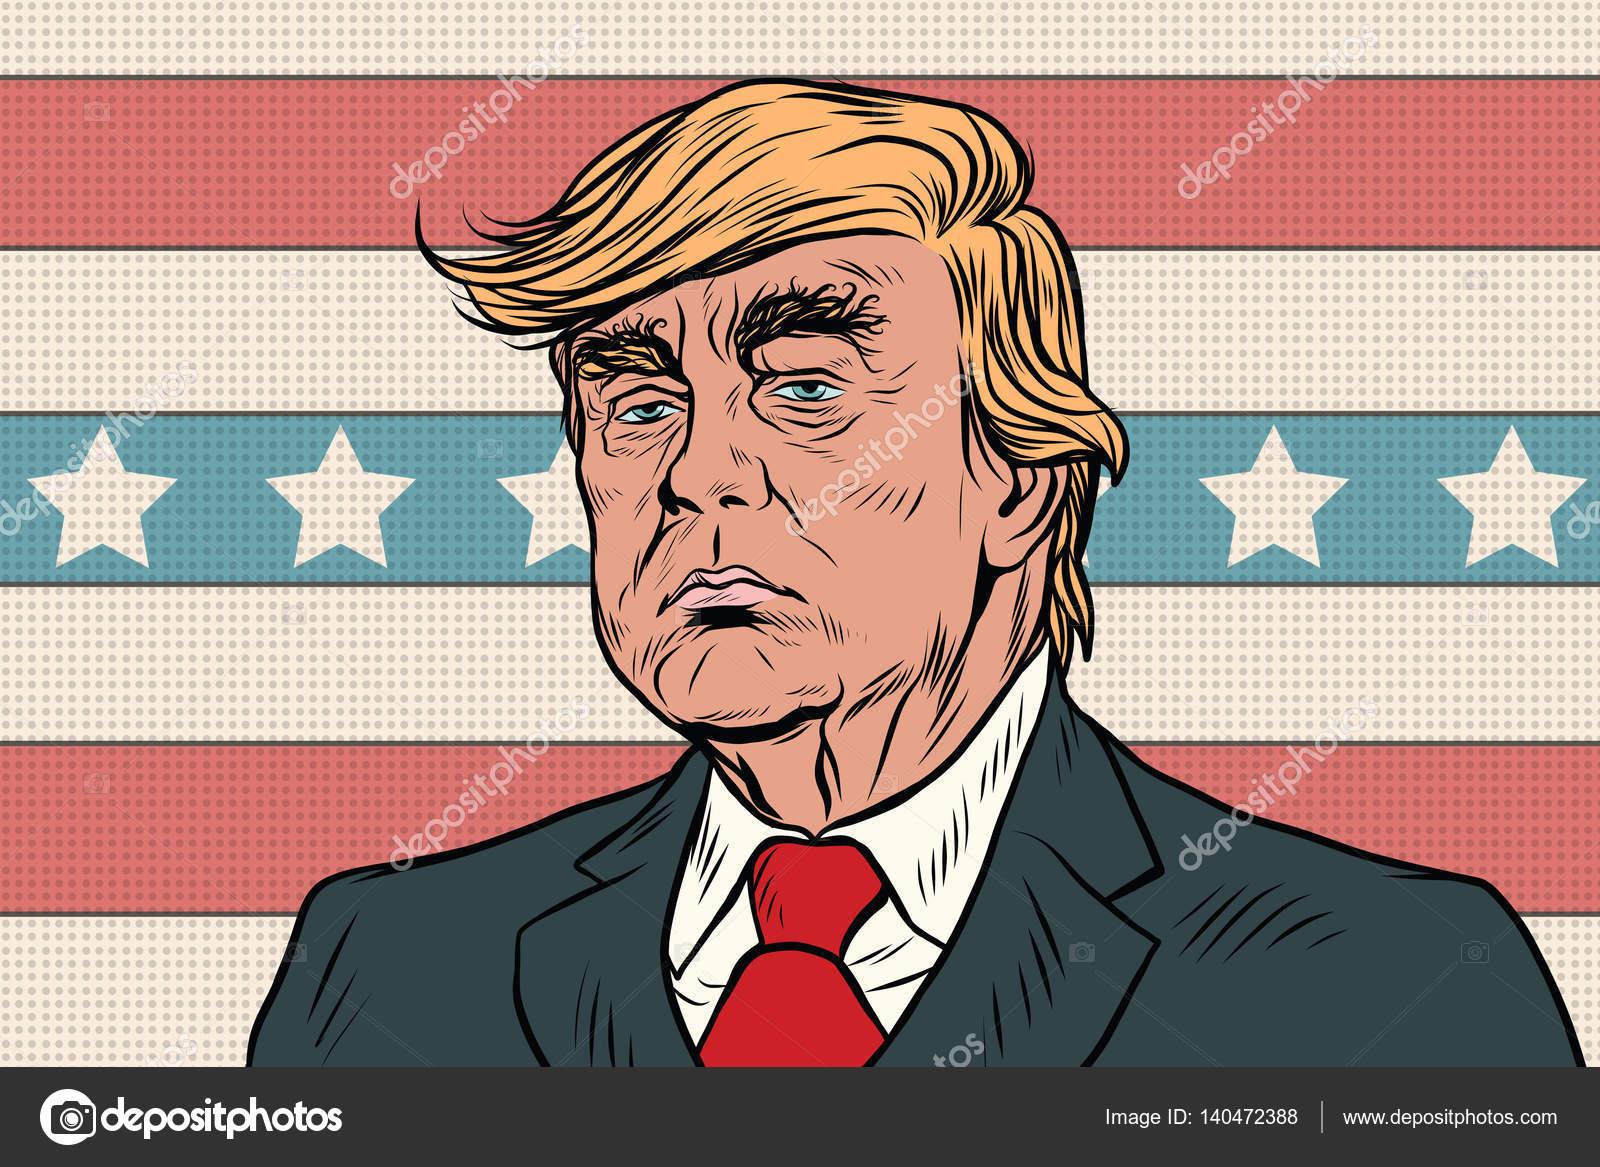 Donald Trump President Of The United States Cartoon Pop Art Retr